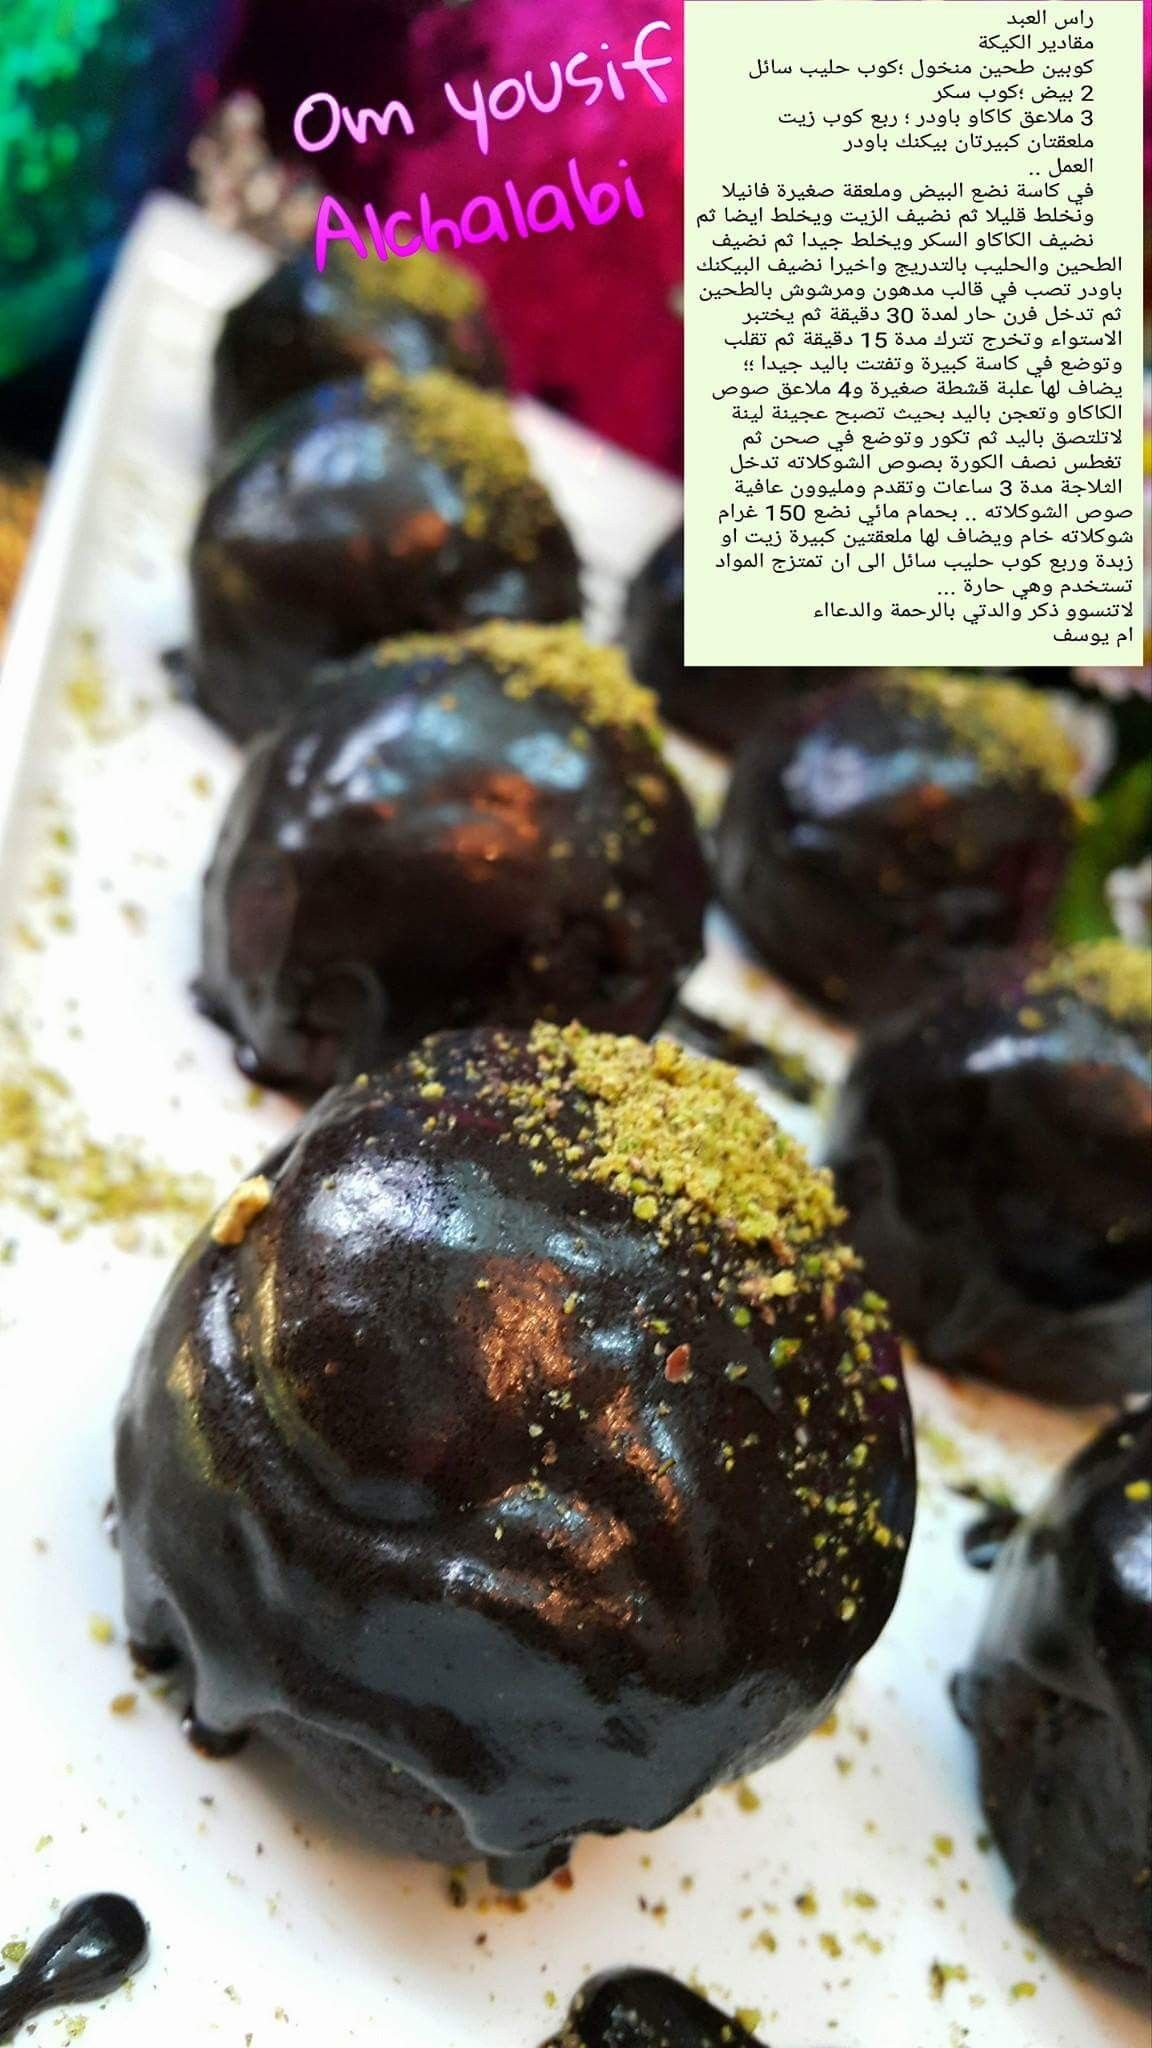 Pin By Mahassen Chahine On اكلات وحلويات ومقبلات عراقيه منقوله Food Recipes Desserts